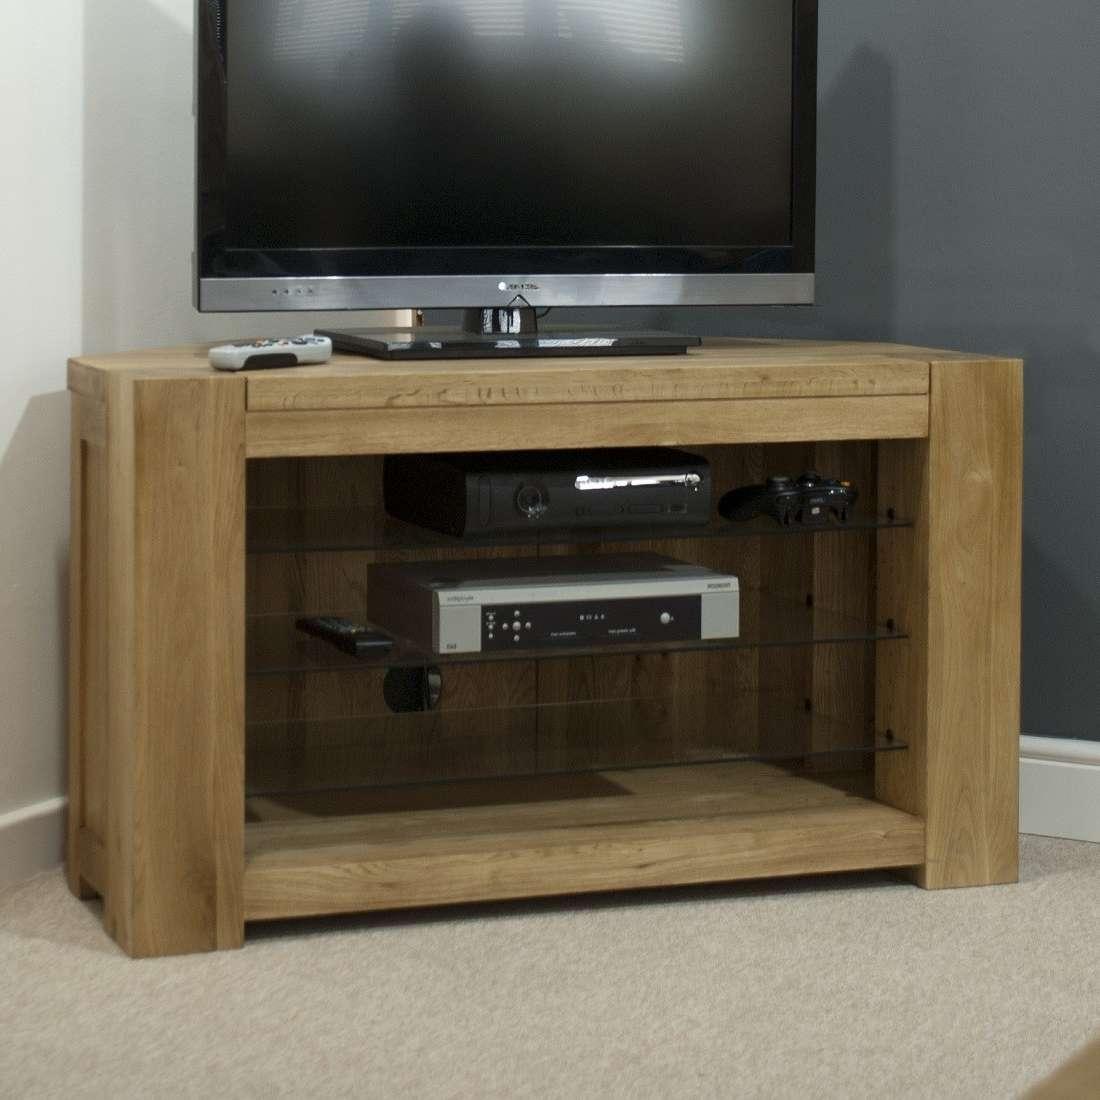 Trend Solid Oak Corner Tv Unit | Oak Furniture Uk Inside Small Oak Corner Tv Stands (View 15 of 15)